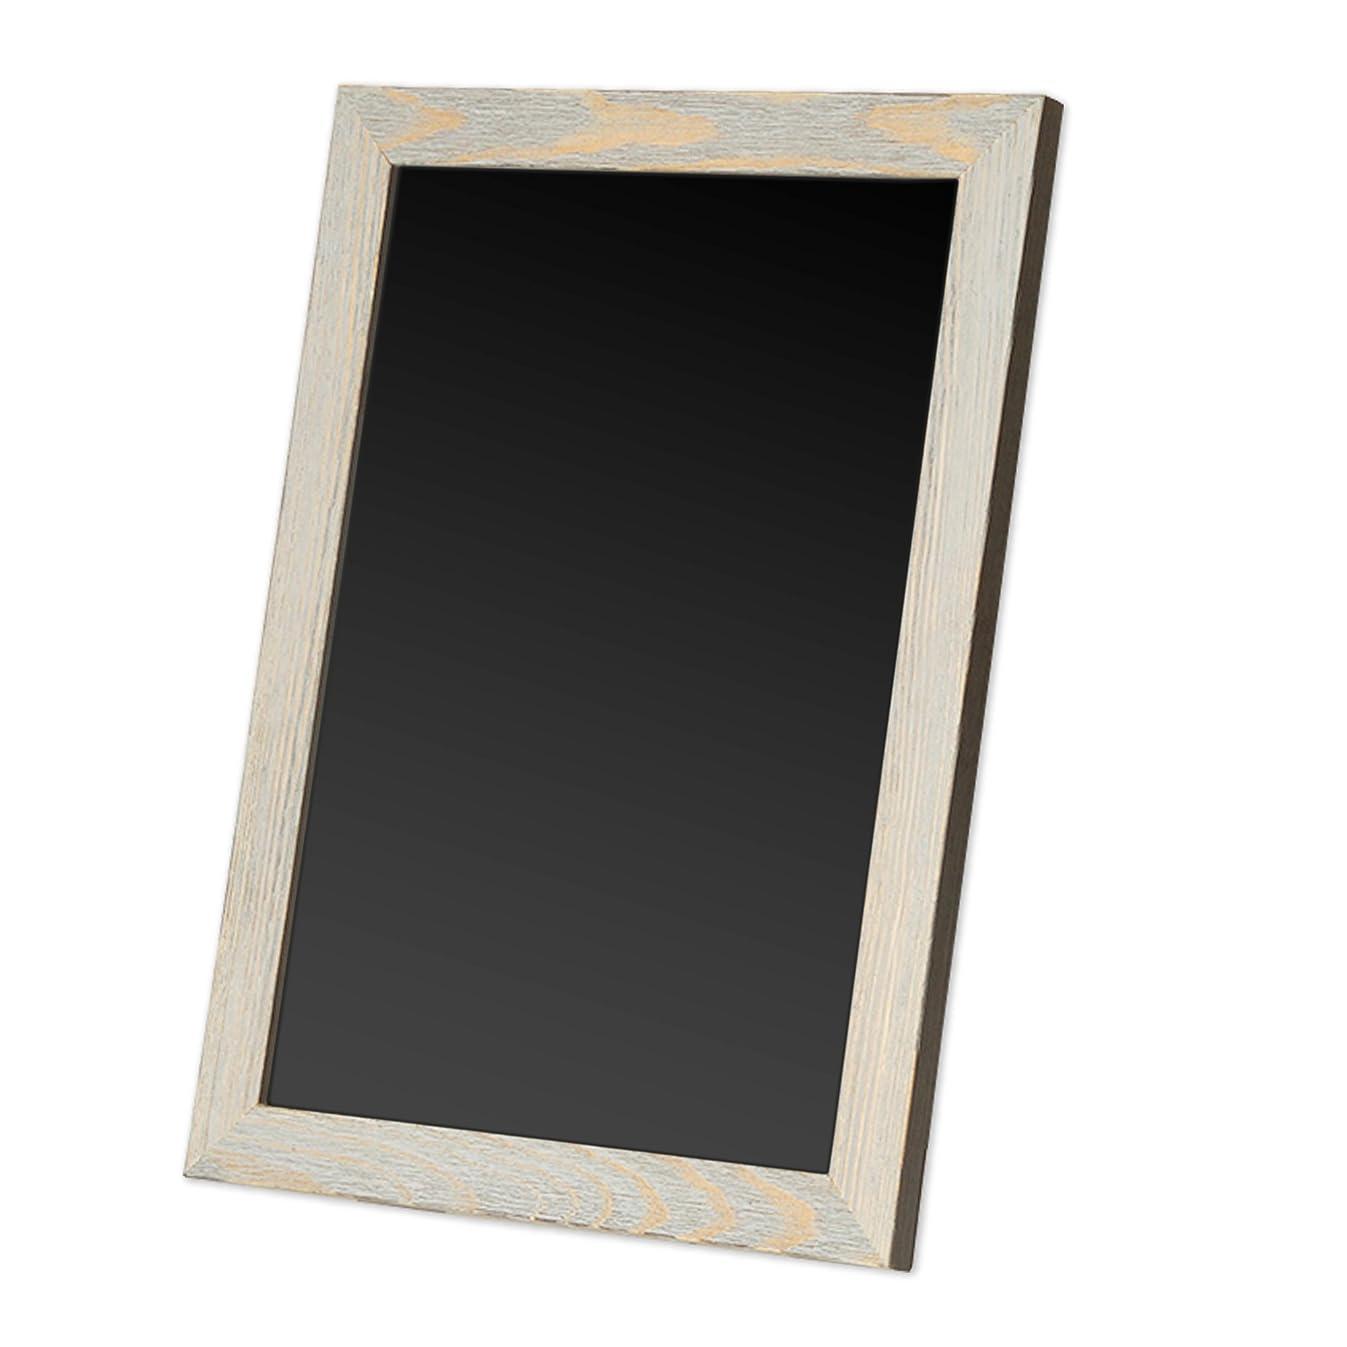 Rustic Wooden Magnetic Kitchen Chalkboard Sign - 12x16 Inch Graywash Framed Hanging Chalk Board for Farmhouse Decor, Wedding, Restaurant & Home